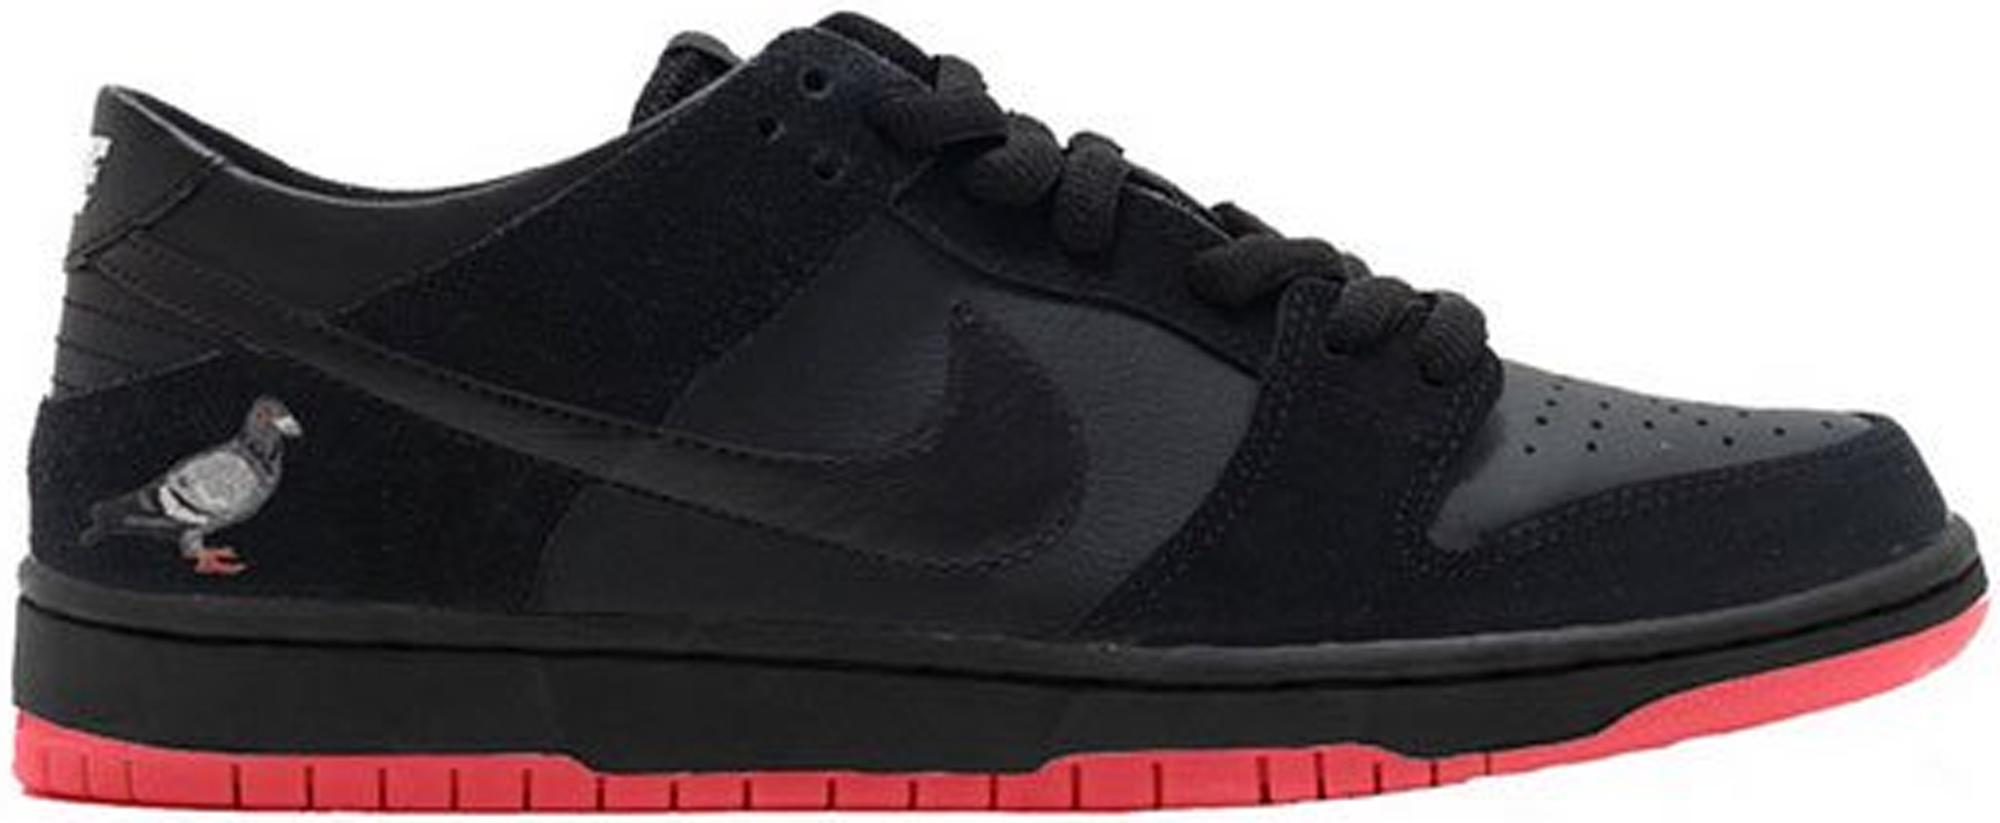 Jeff Staple x Nike SB Dunk Low Black